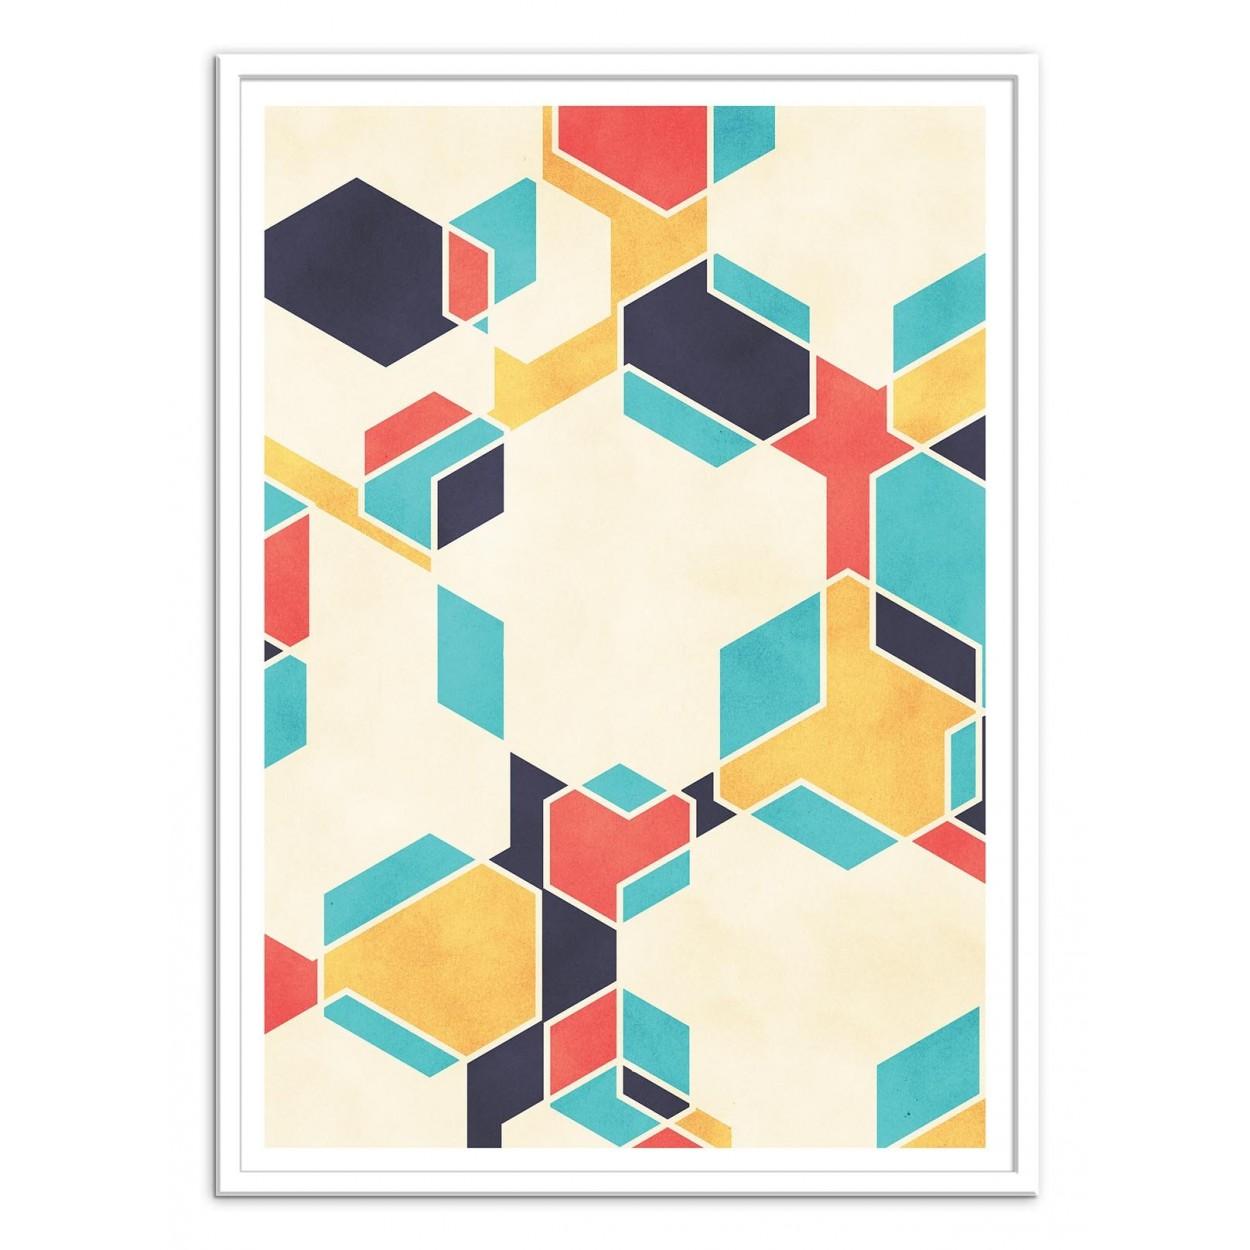 affiche art poster decoration illustration abstraite art contemporain. Black Bedroom Furniture Sets. Home Design Ideas